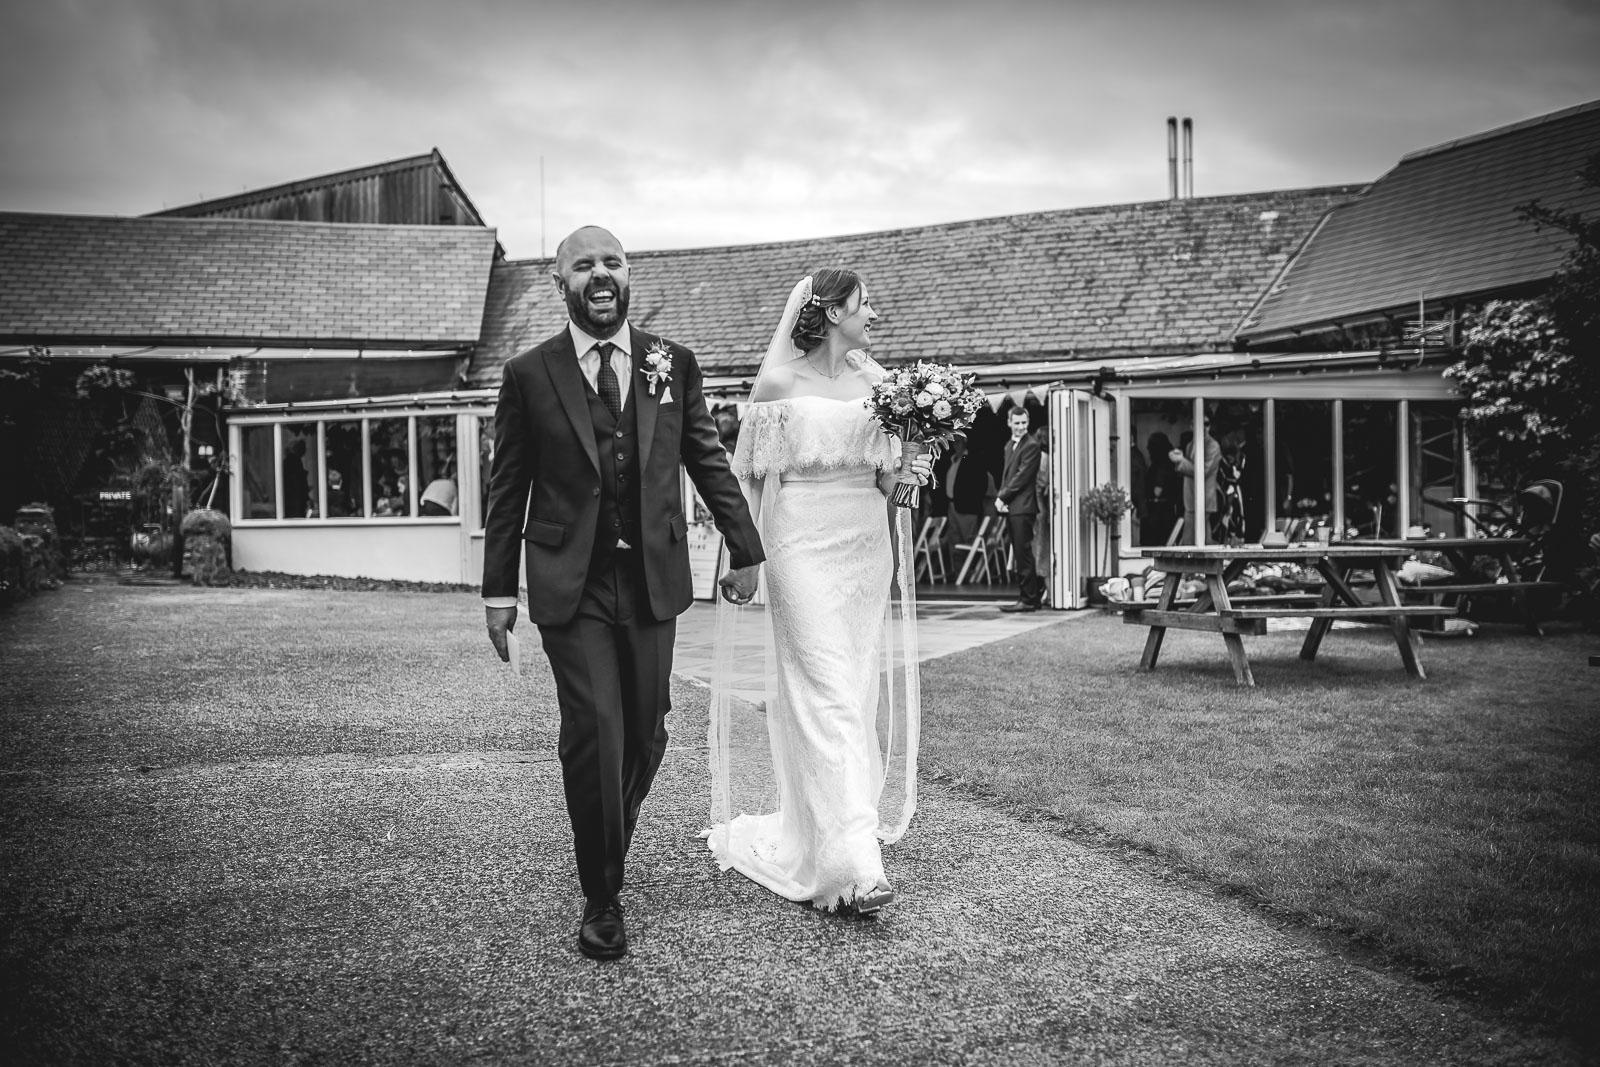 the old barn - clovelly - ugotthelove - wedding photography-7751.jpg